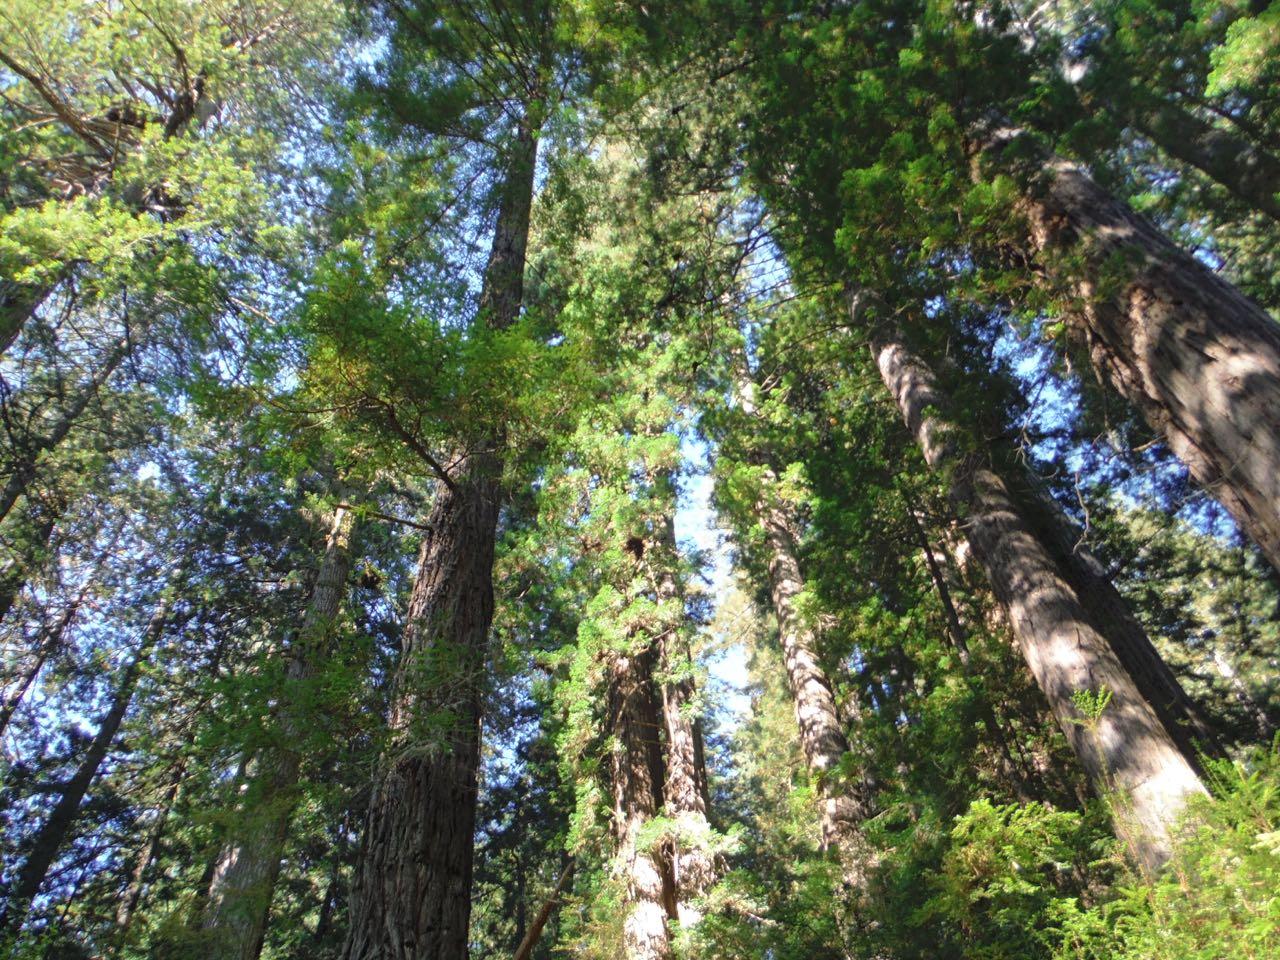 Redwoods 2017 10 08 213 Of 287